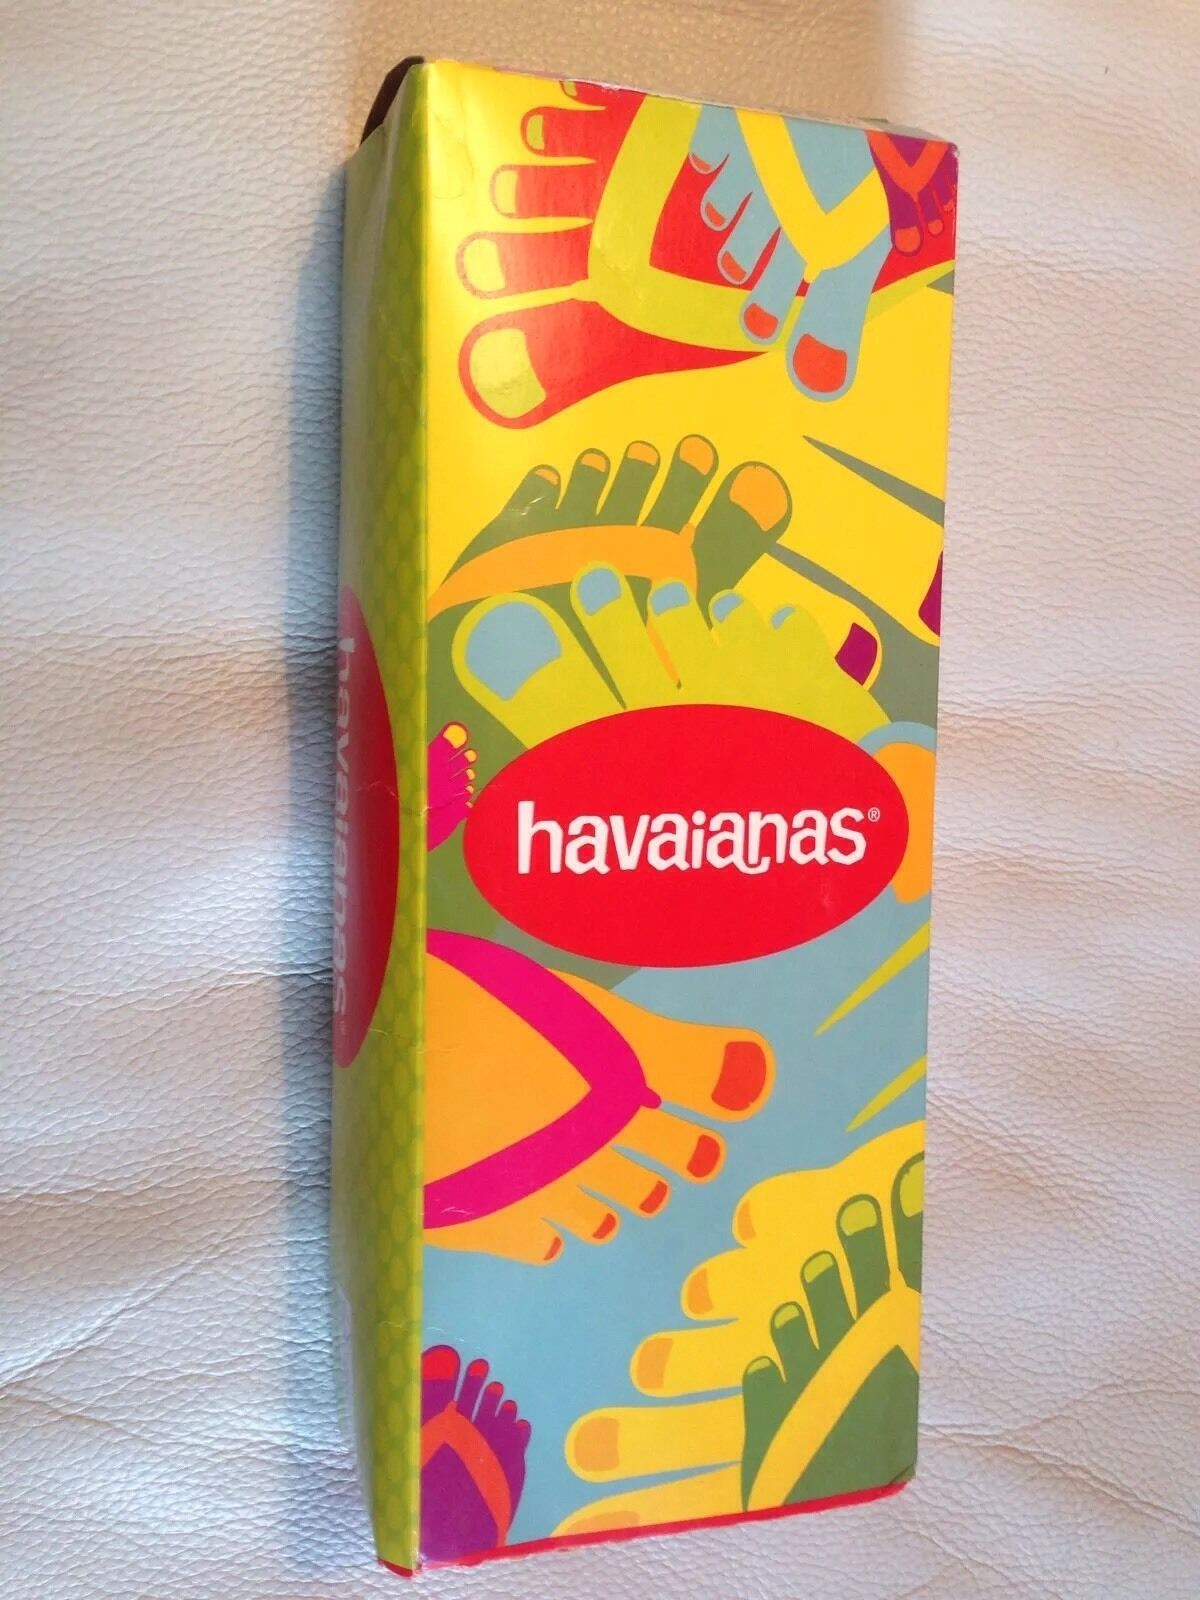 HAVAIANAS Slim Size 2 - 3 GIRLS WOMENS Flip Flops Sandals Shoes NEW Lady